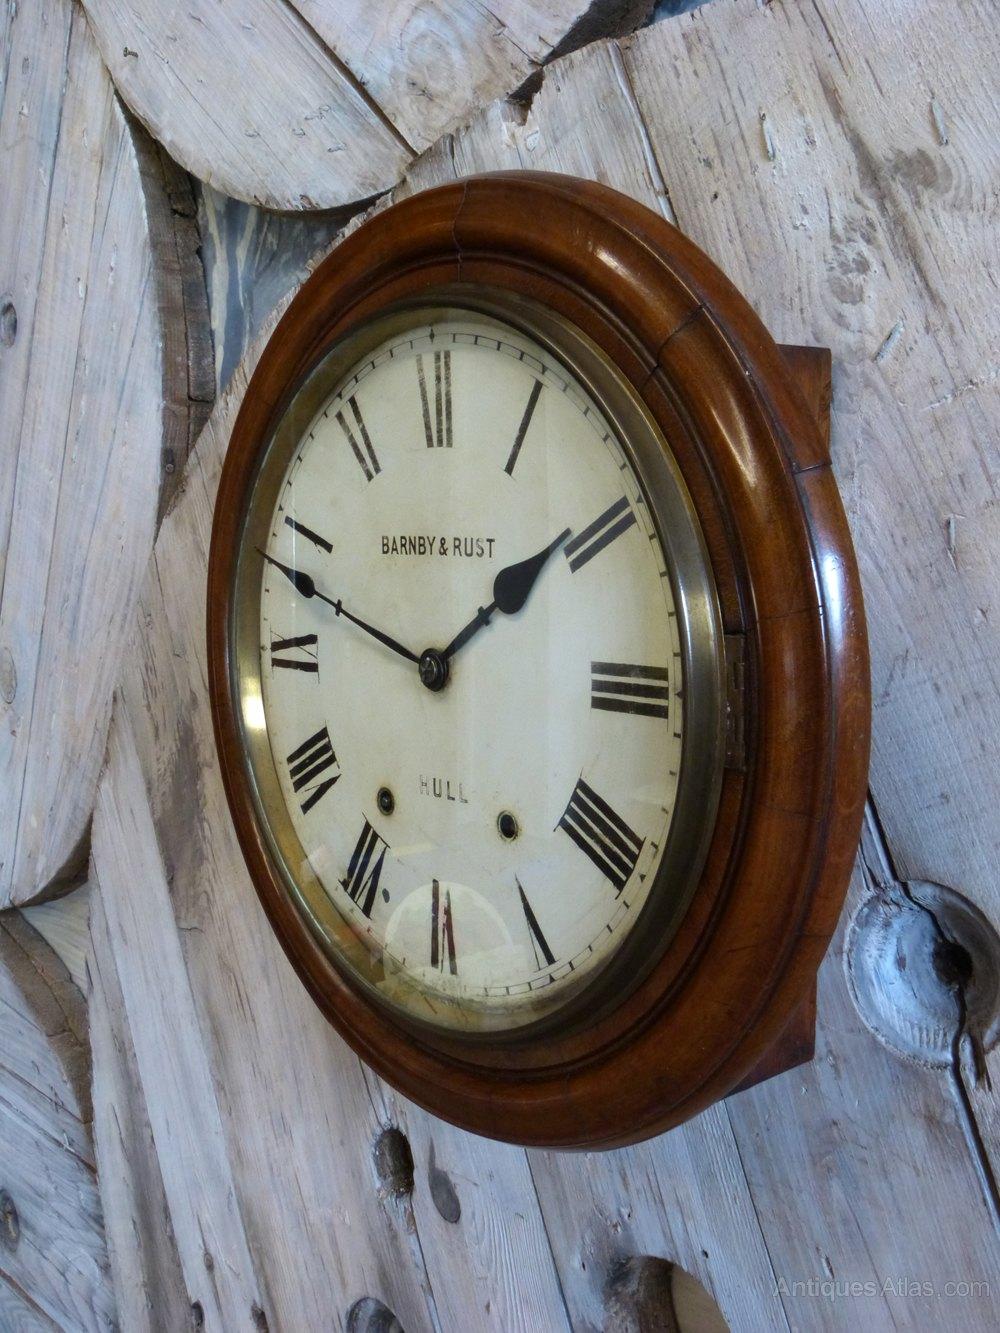 Antiques atlas barnby rust of hull railway wall clock wall clock alt5 amipublicfo Gallery